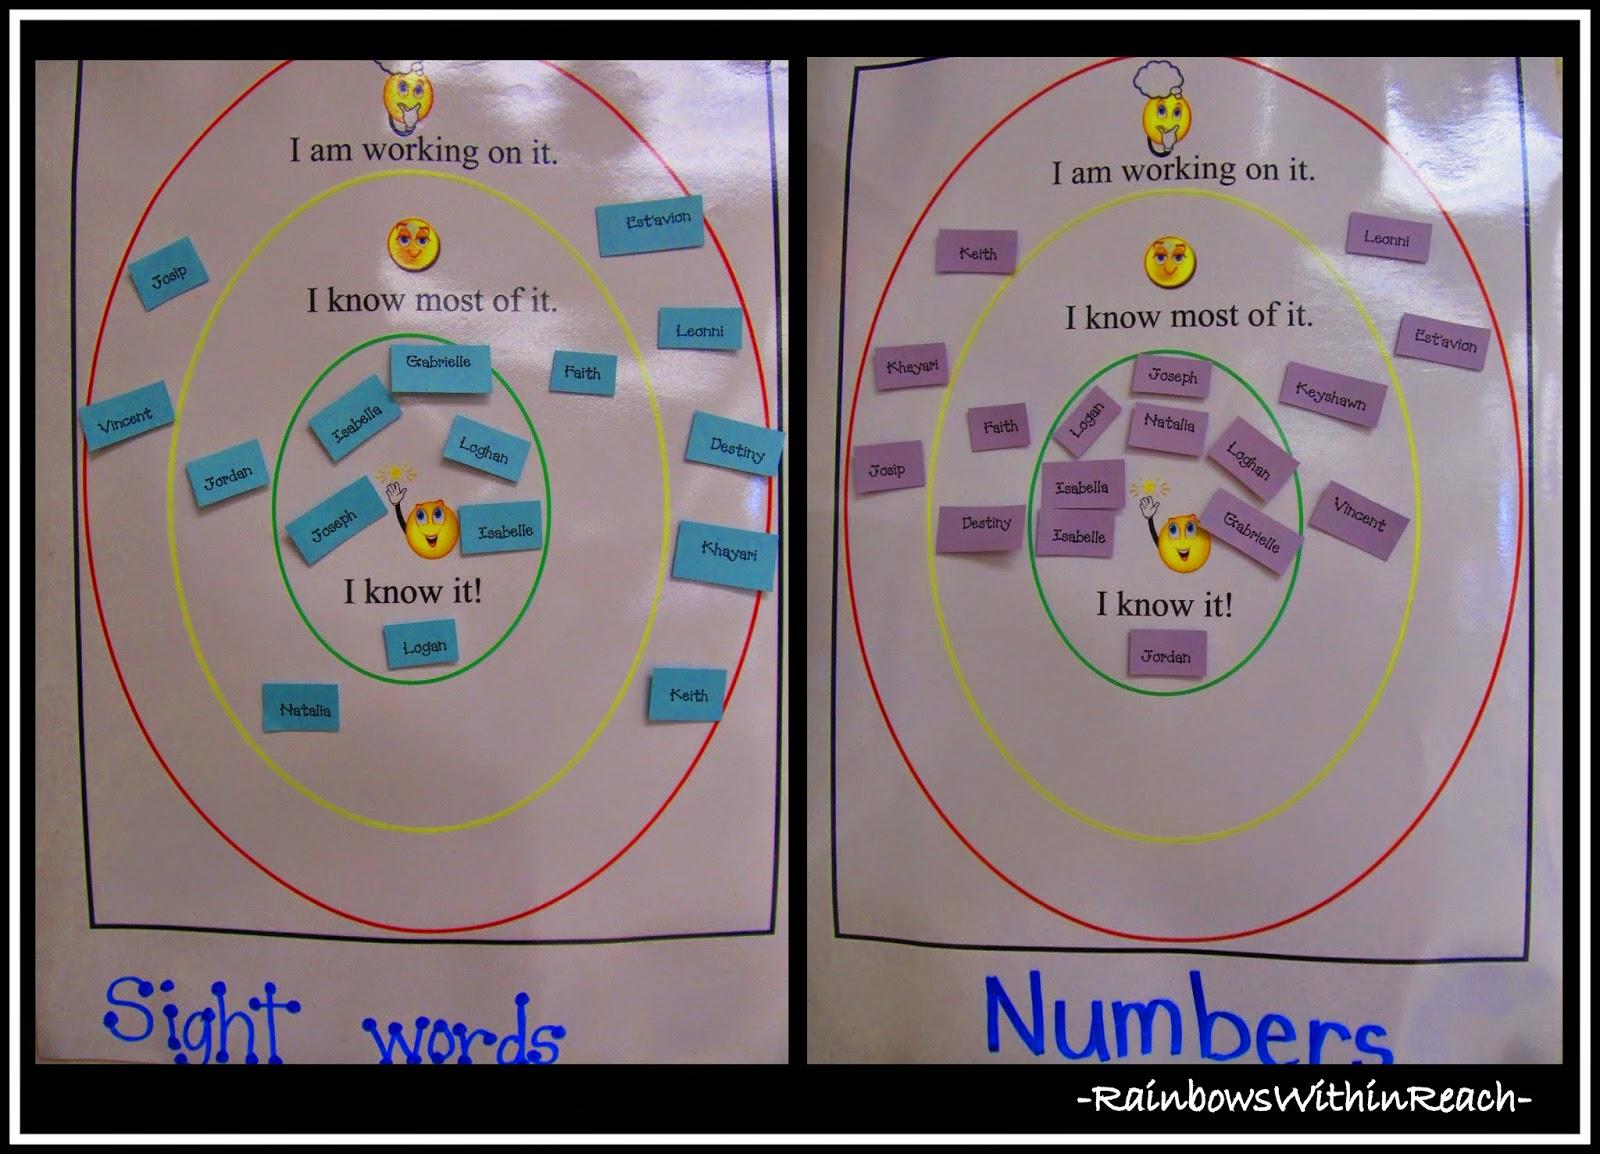 Graph of Progress Toward Goals in Kindergarten at RainbowsWithinReach